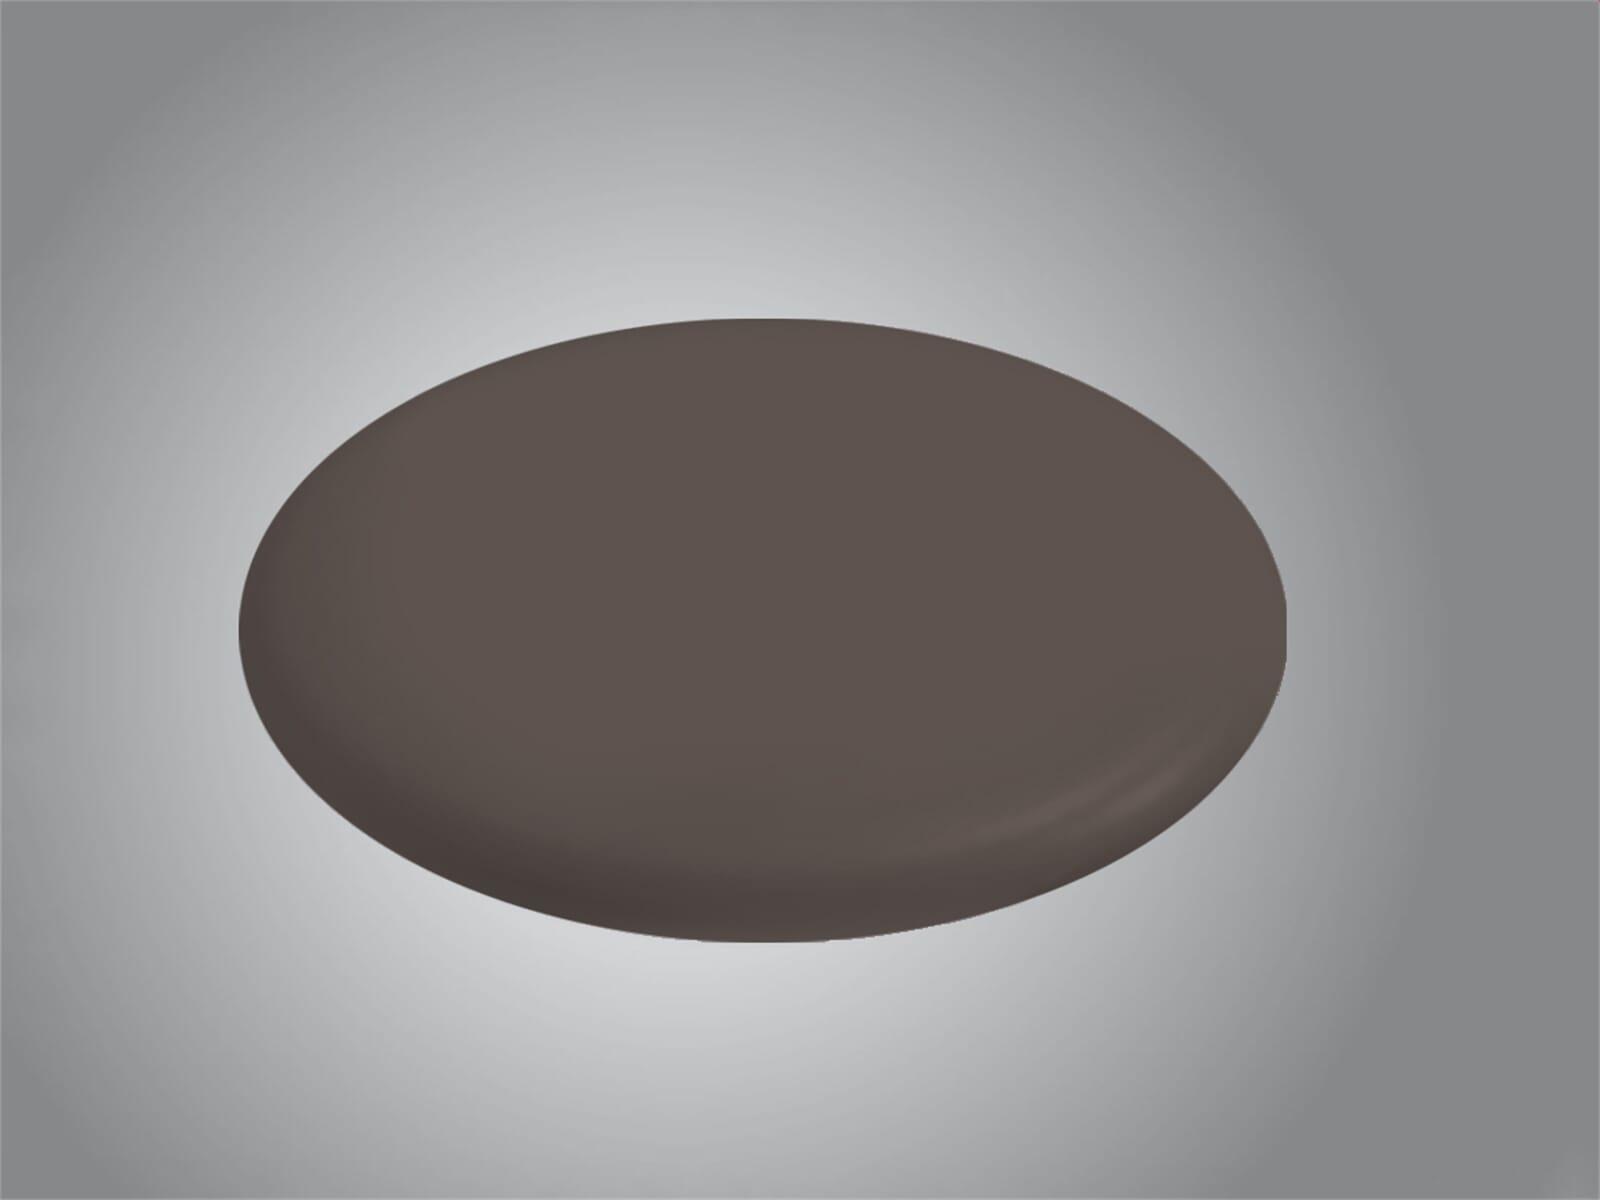 Systemceram Sink Cover Keramik Siena 090665